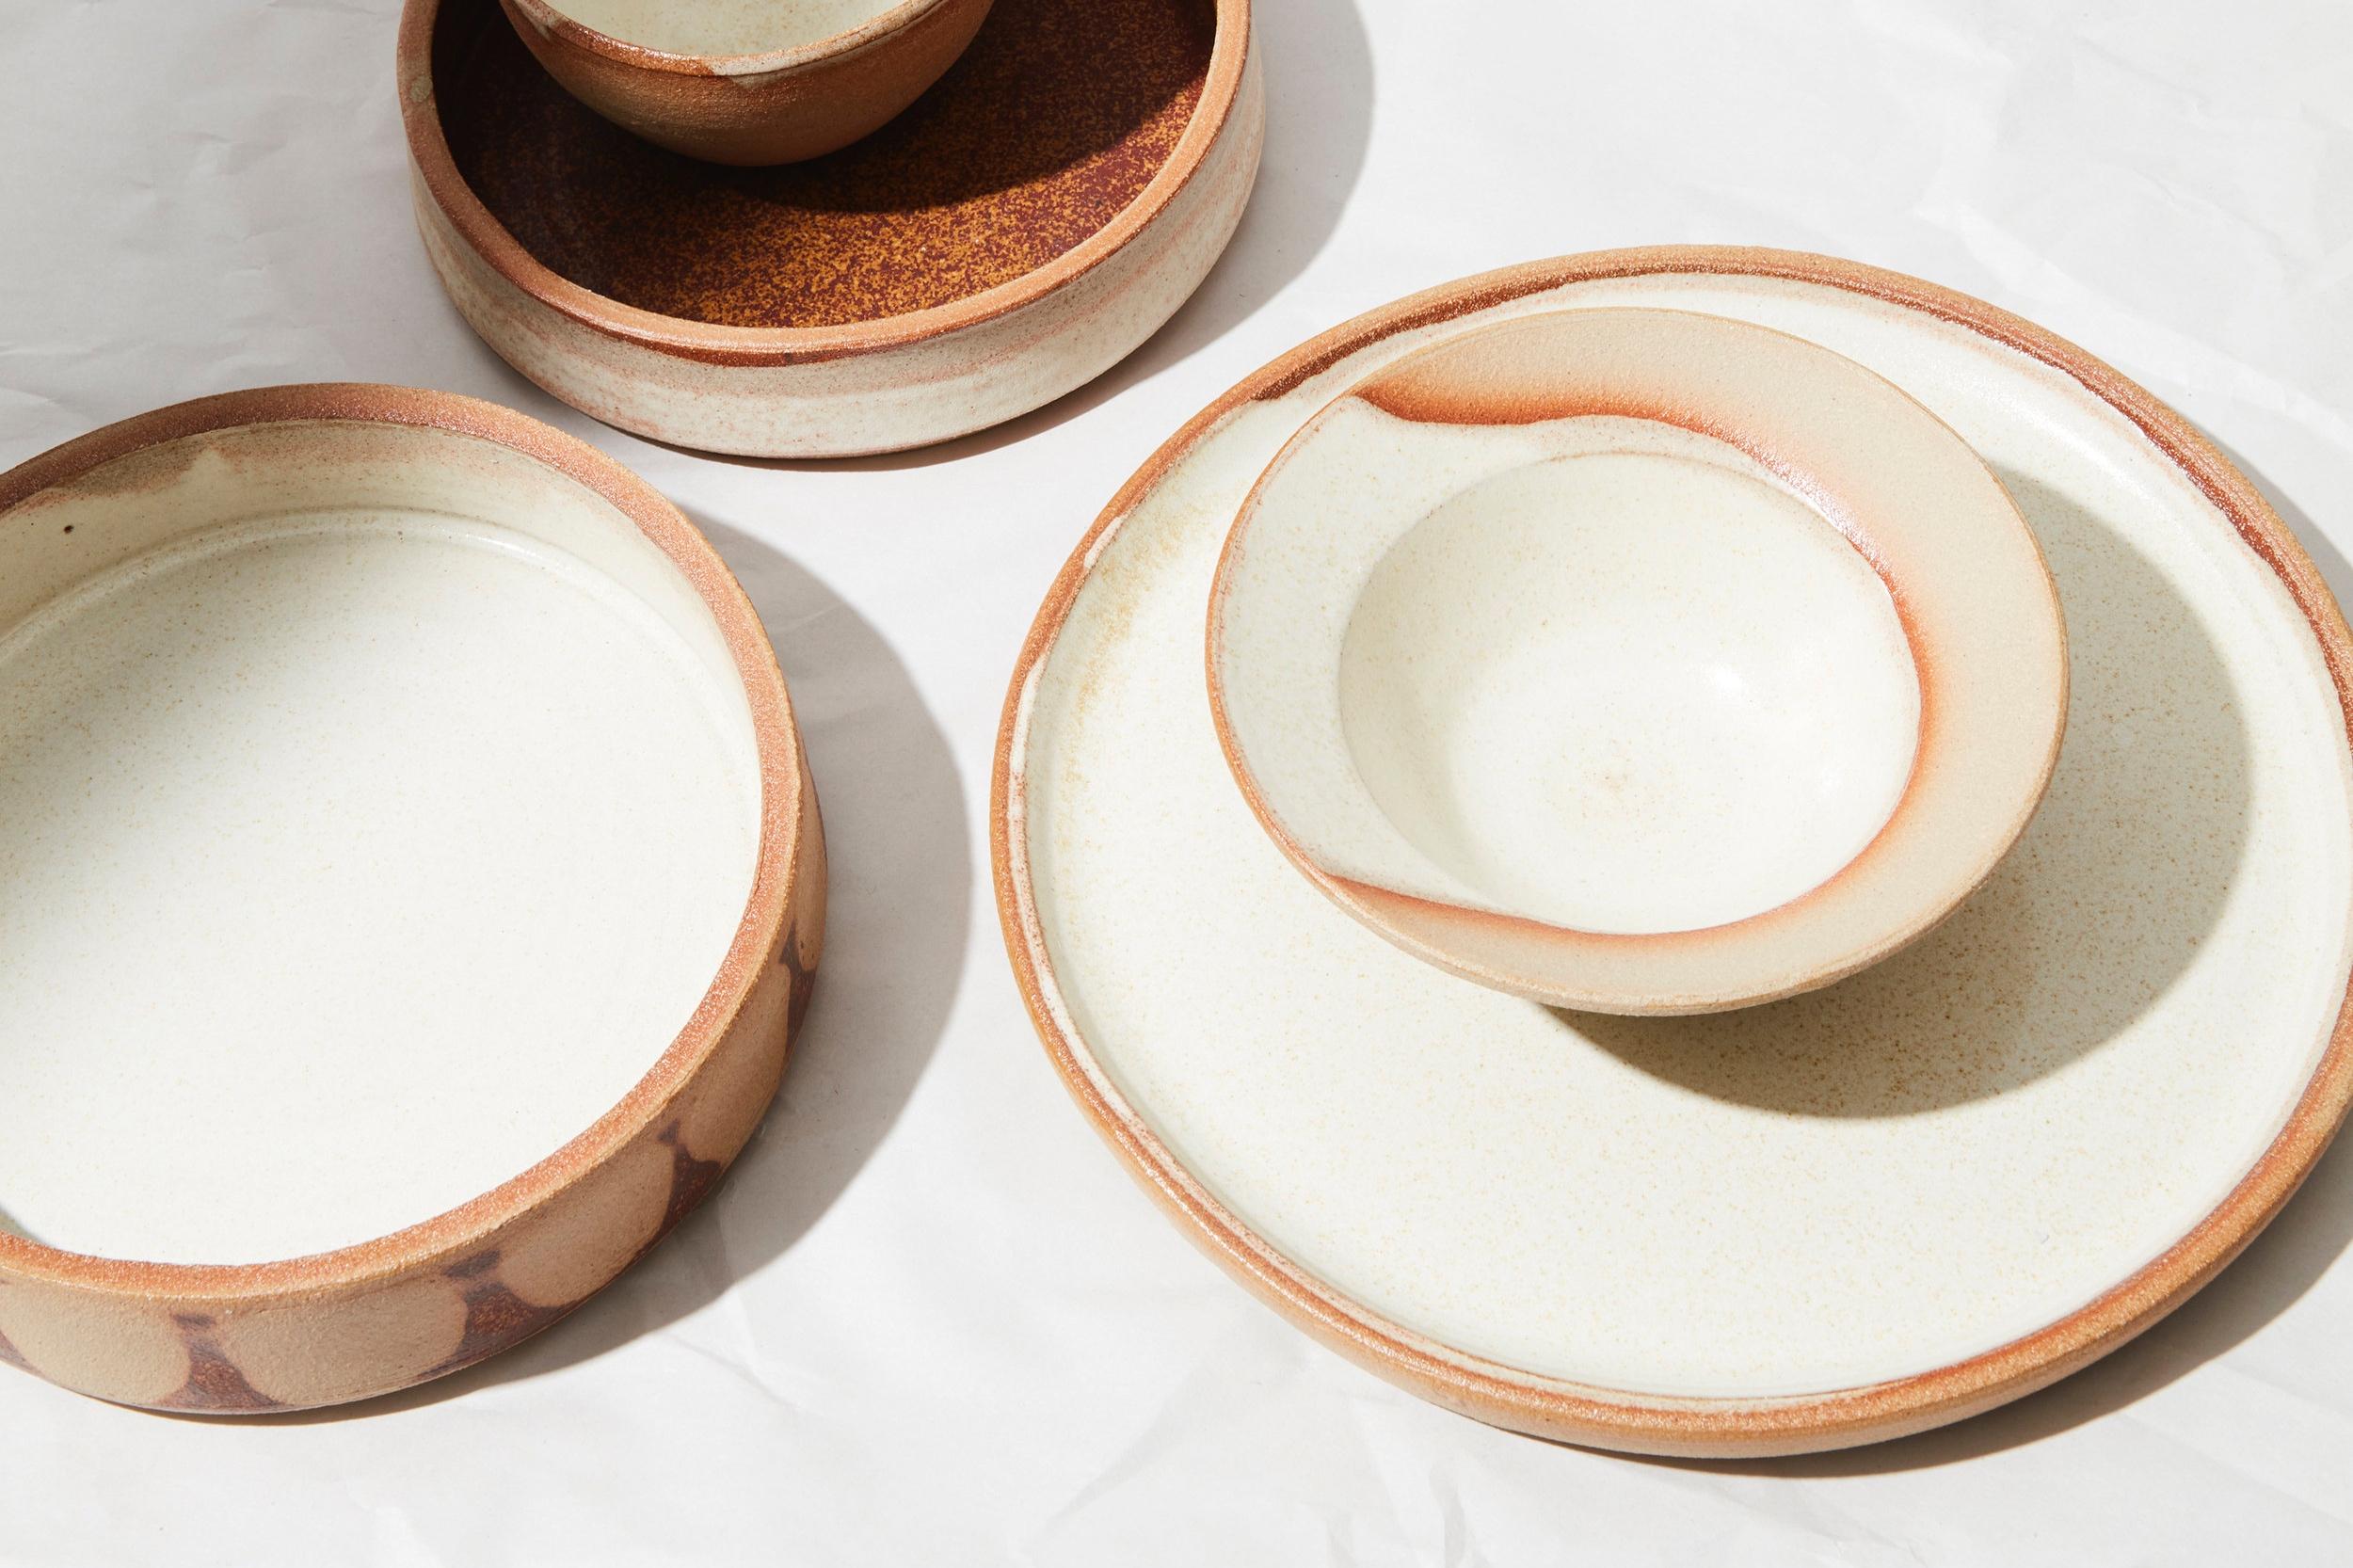 Pegboard_Pottery25587.jpg